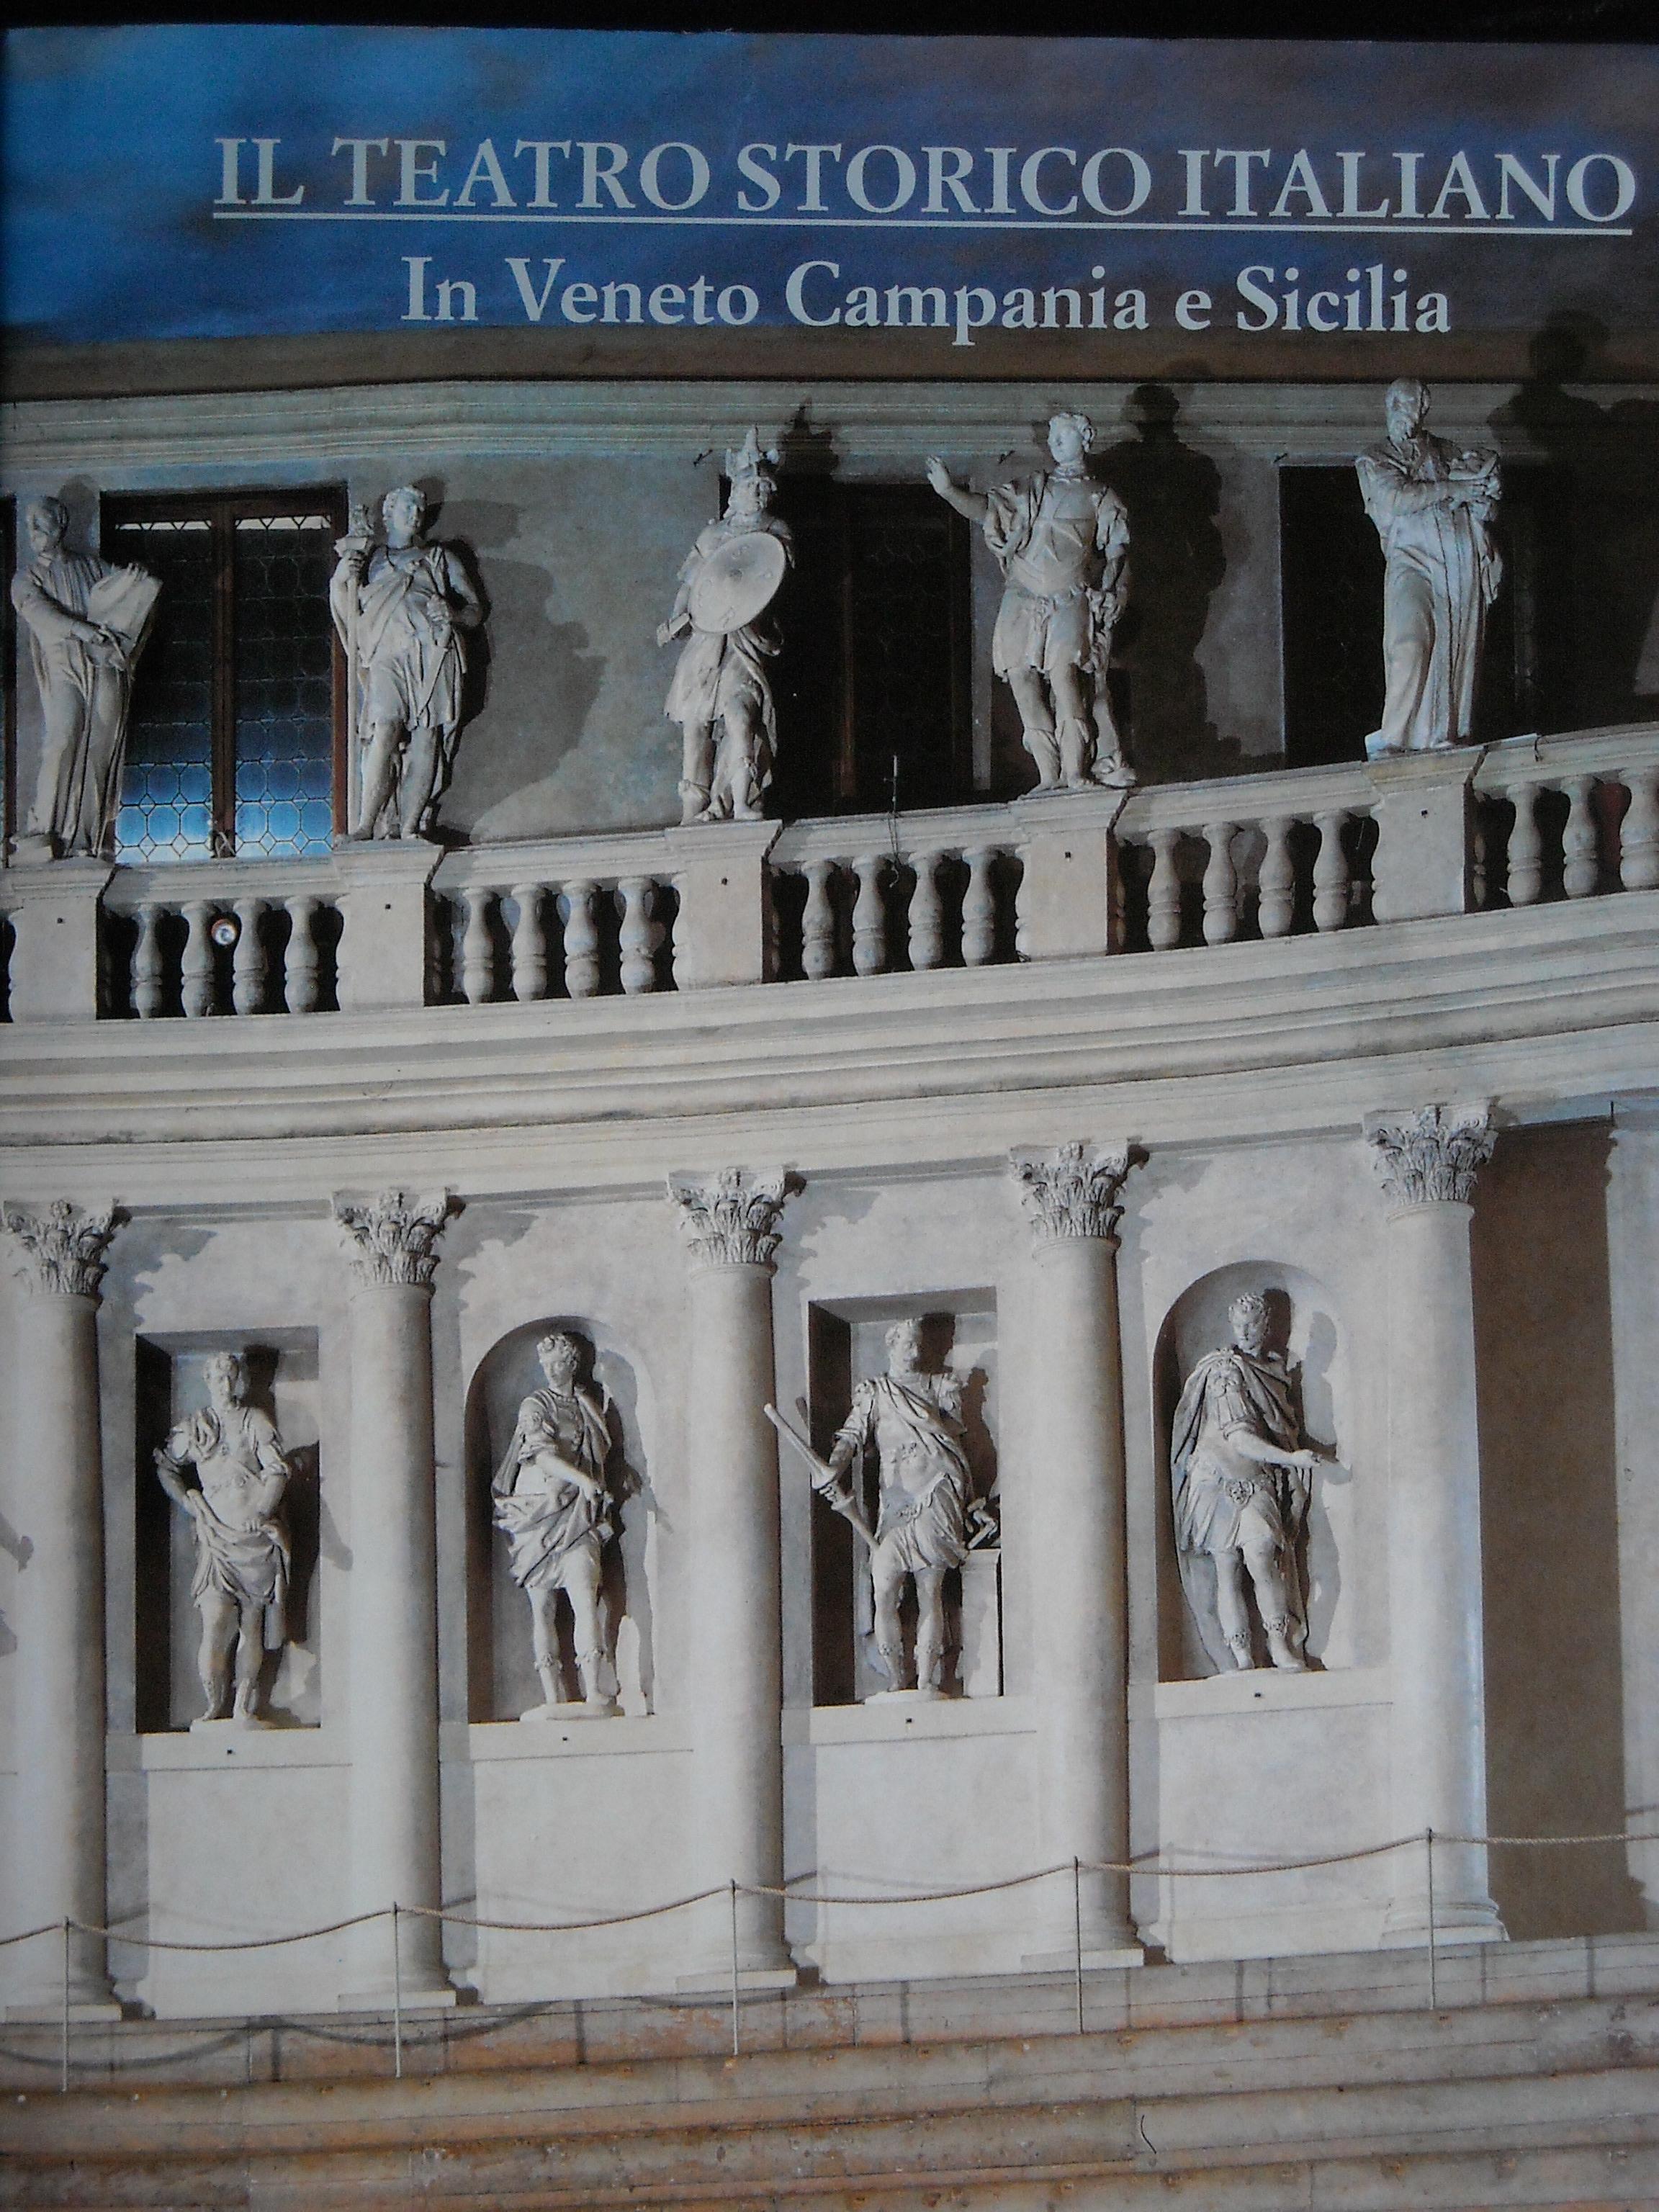 Il teatro storico it...